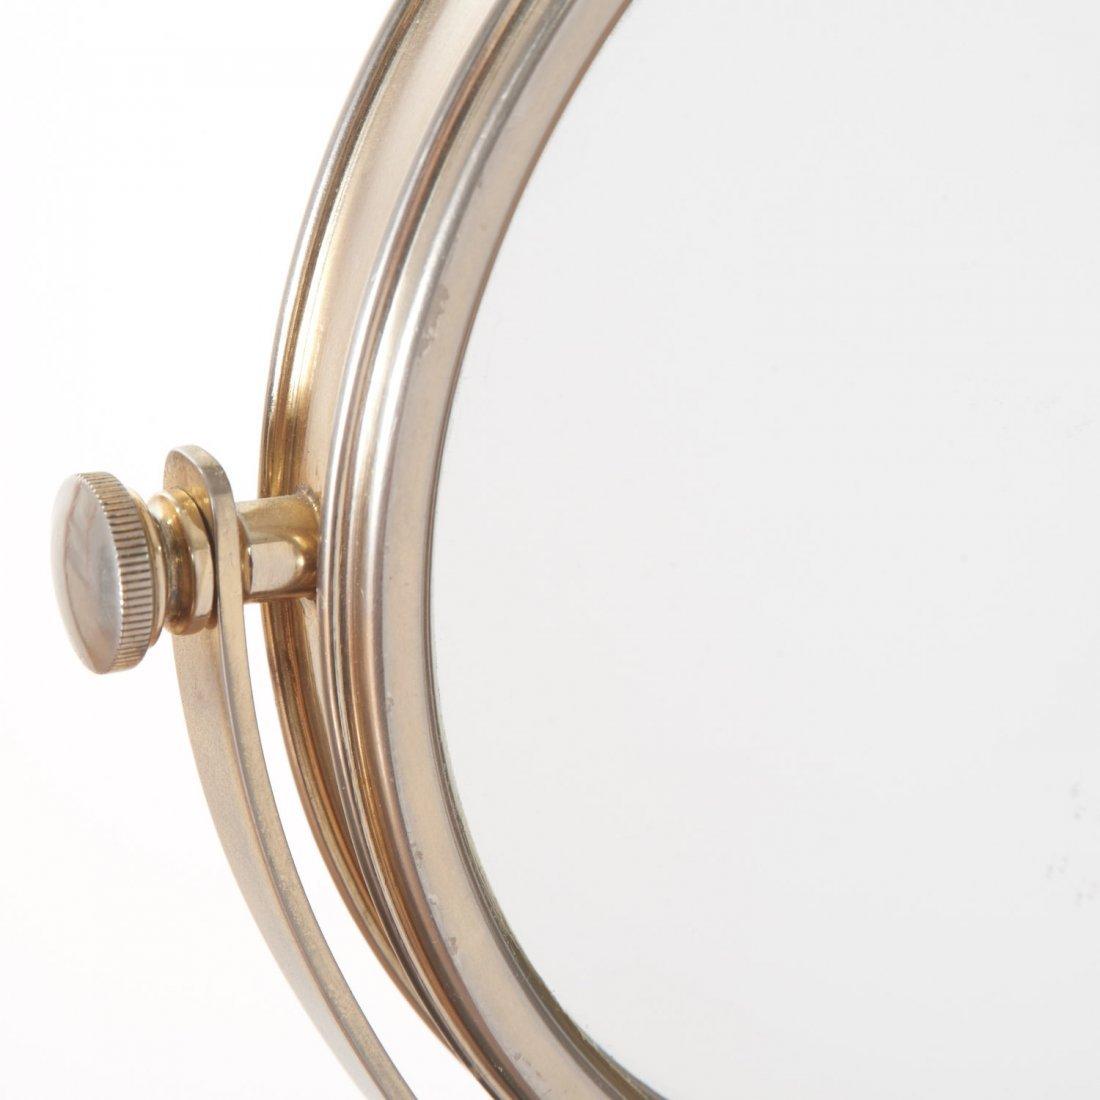 Aldo Tura lacquer, parchment valet/vanity stands - 8